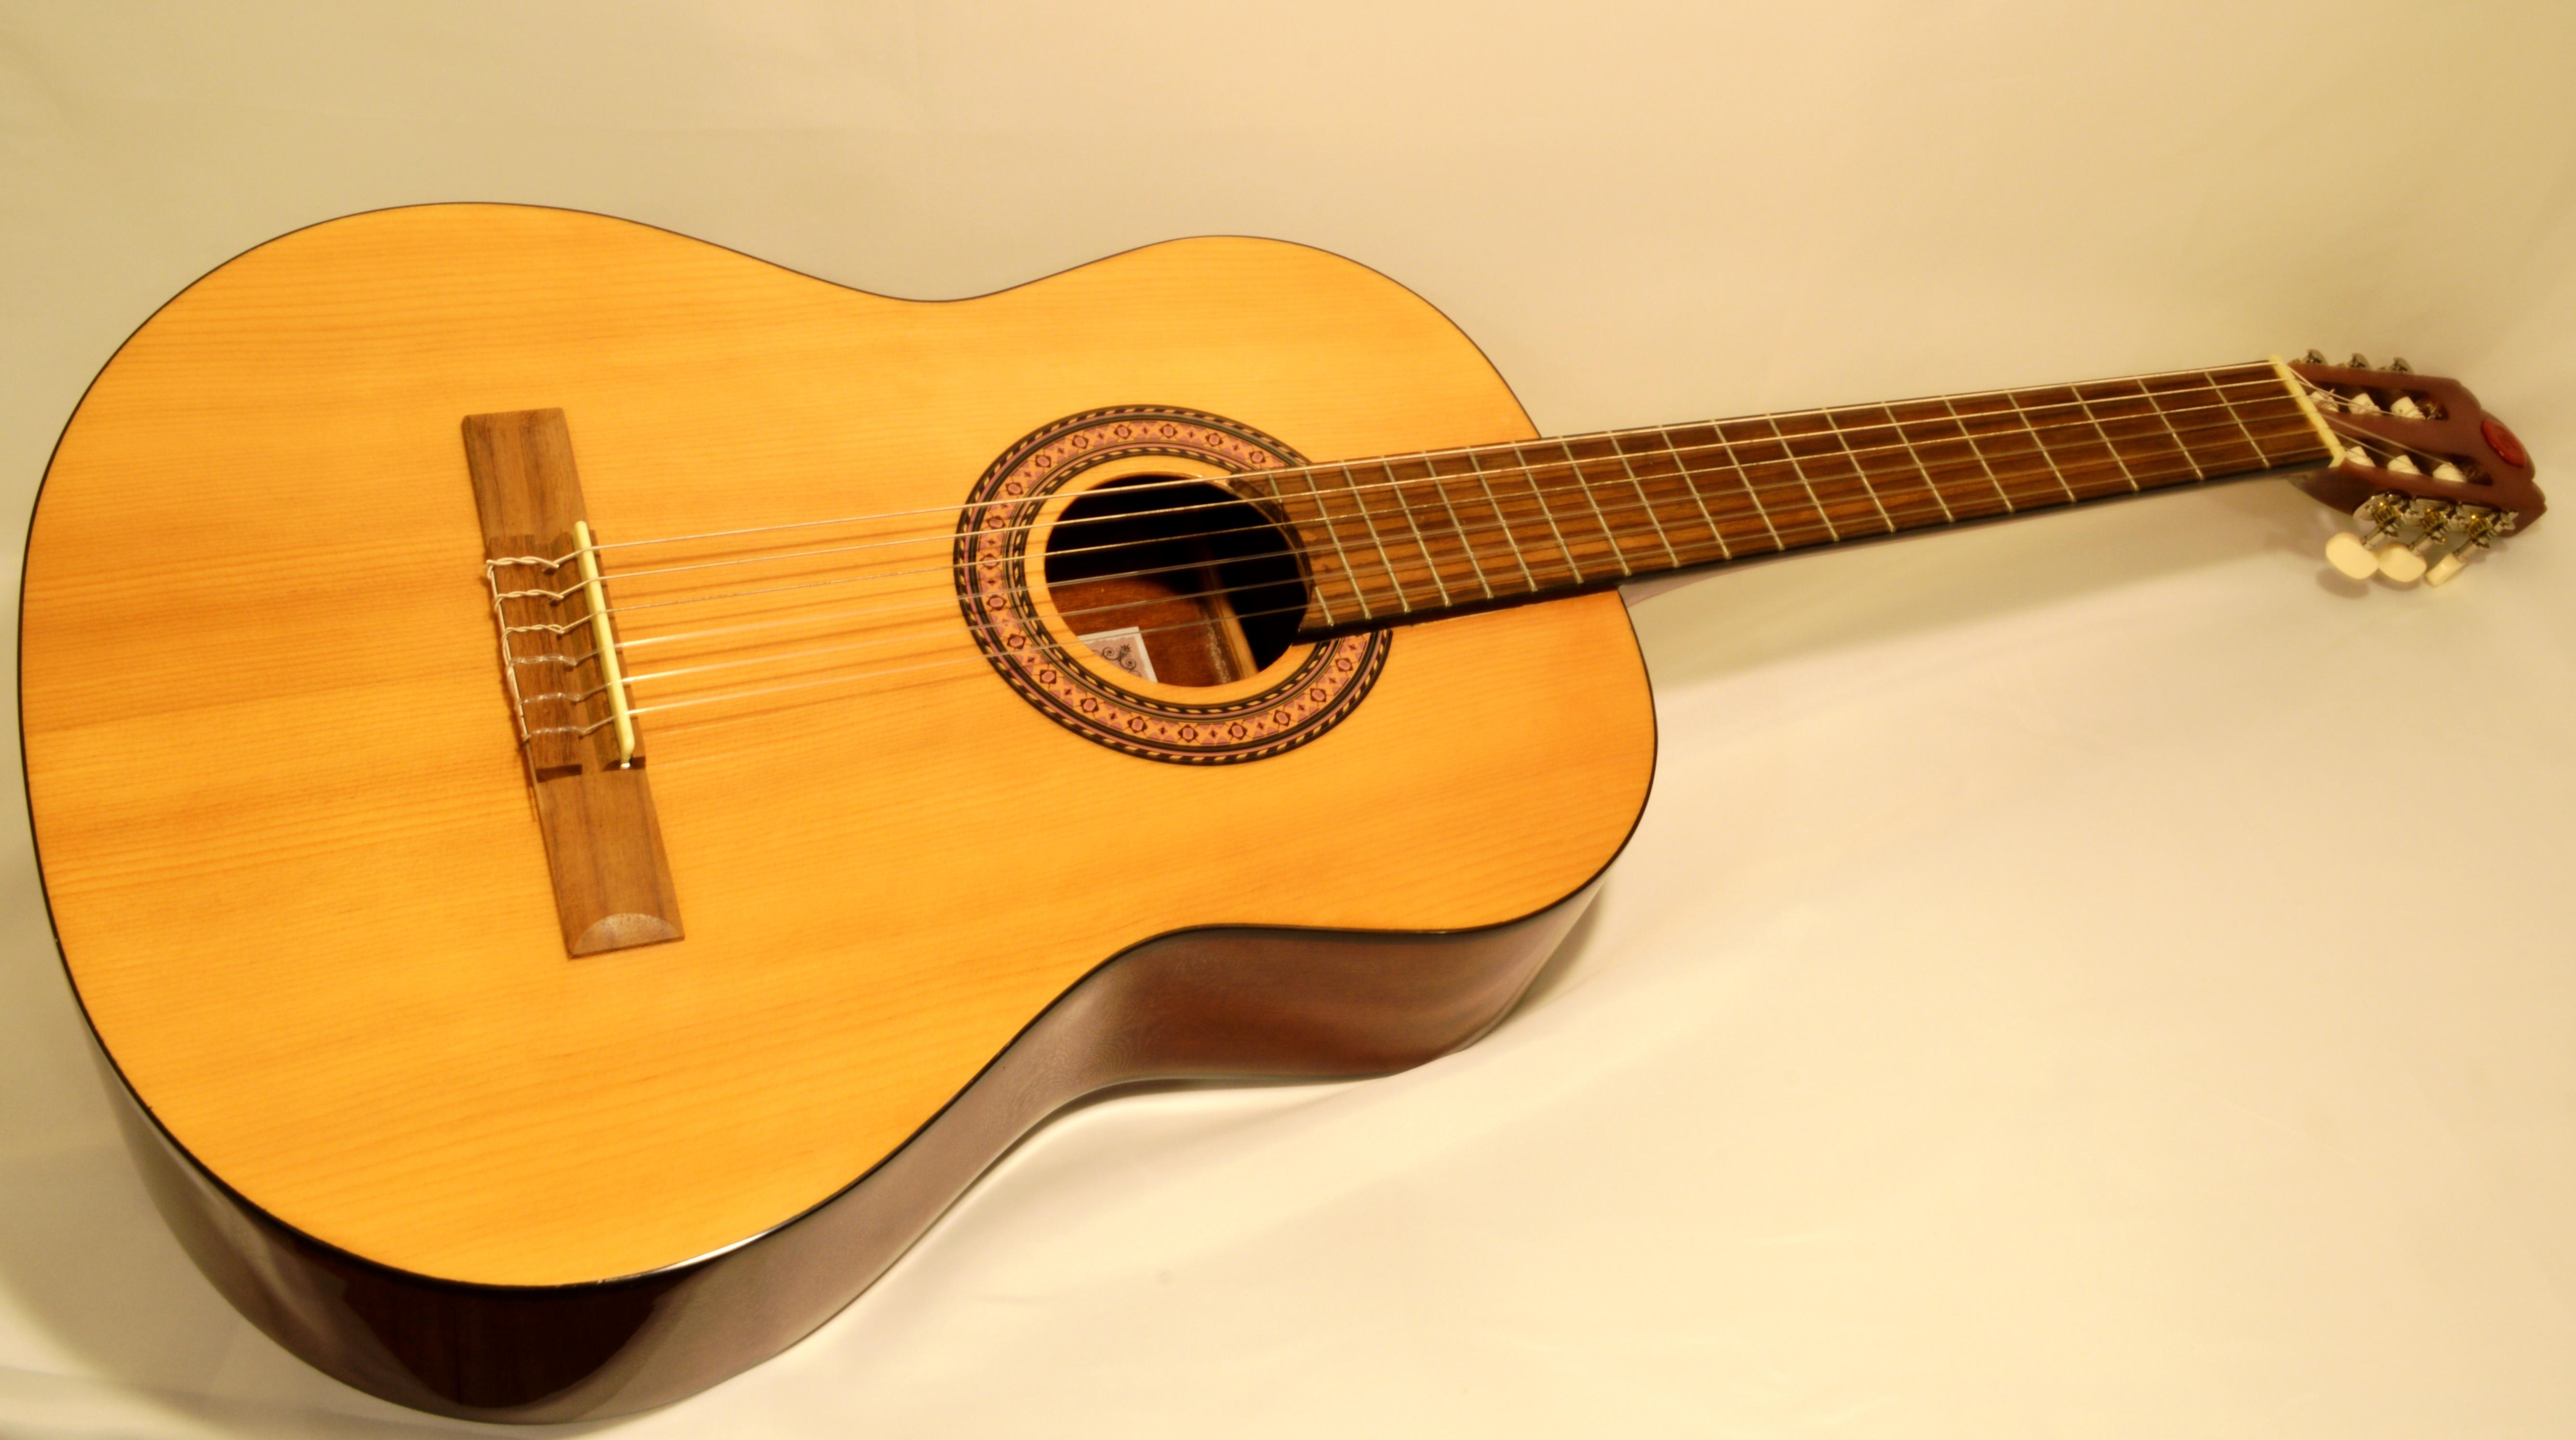 beginner acoustic guitar chateau c08 06 san marino music center. Black Bedroom Furniture Sets. Home Design Ideas